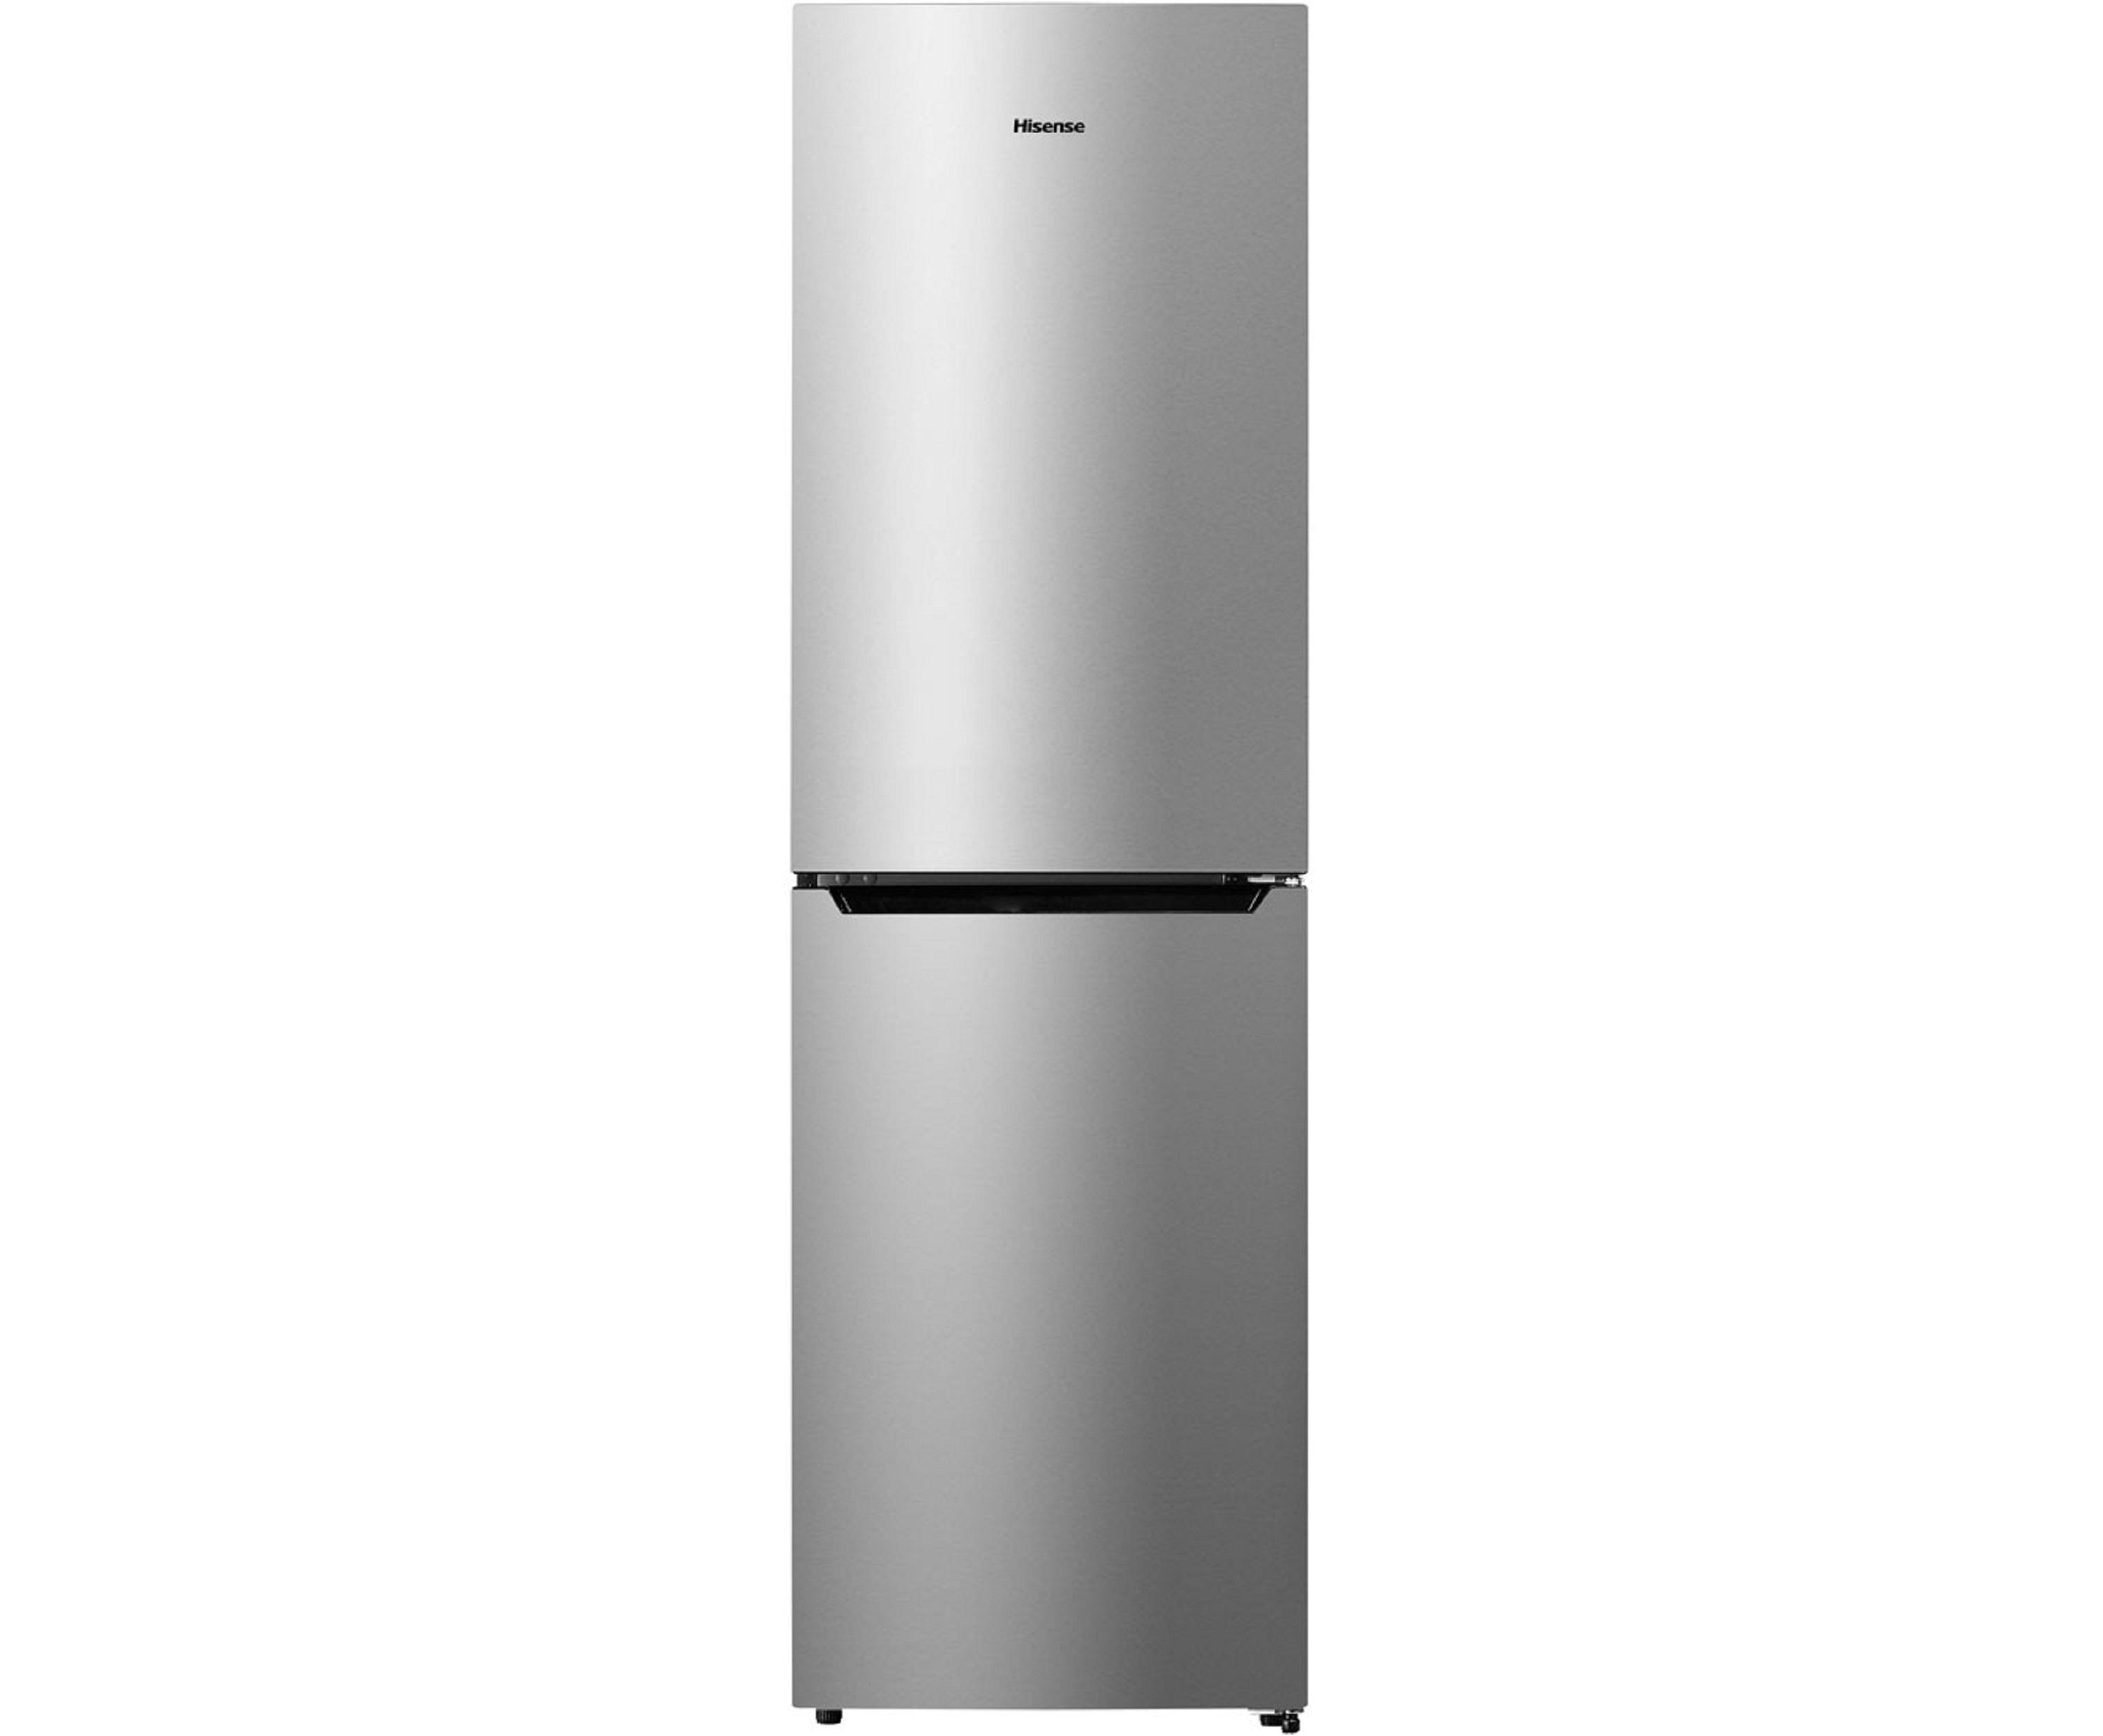 Bomann Kühlschrank Türanschlag Wechseln : Hisense rb338n4ag2 kühl gefrier kombination a no frost